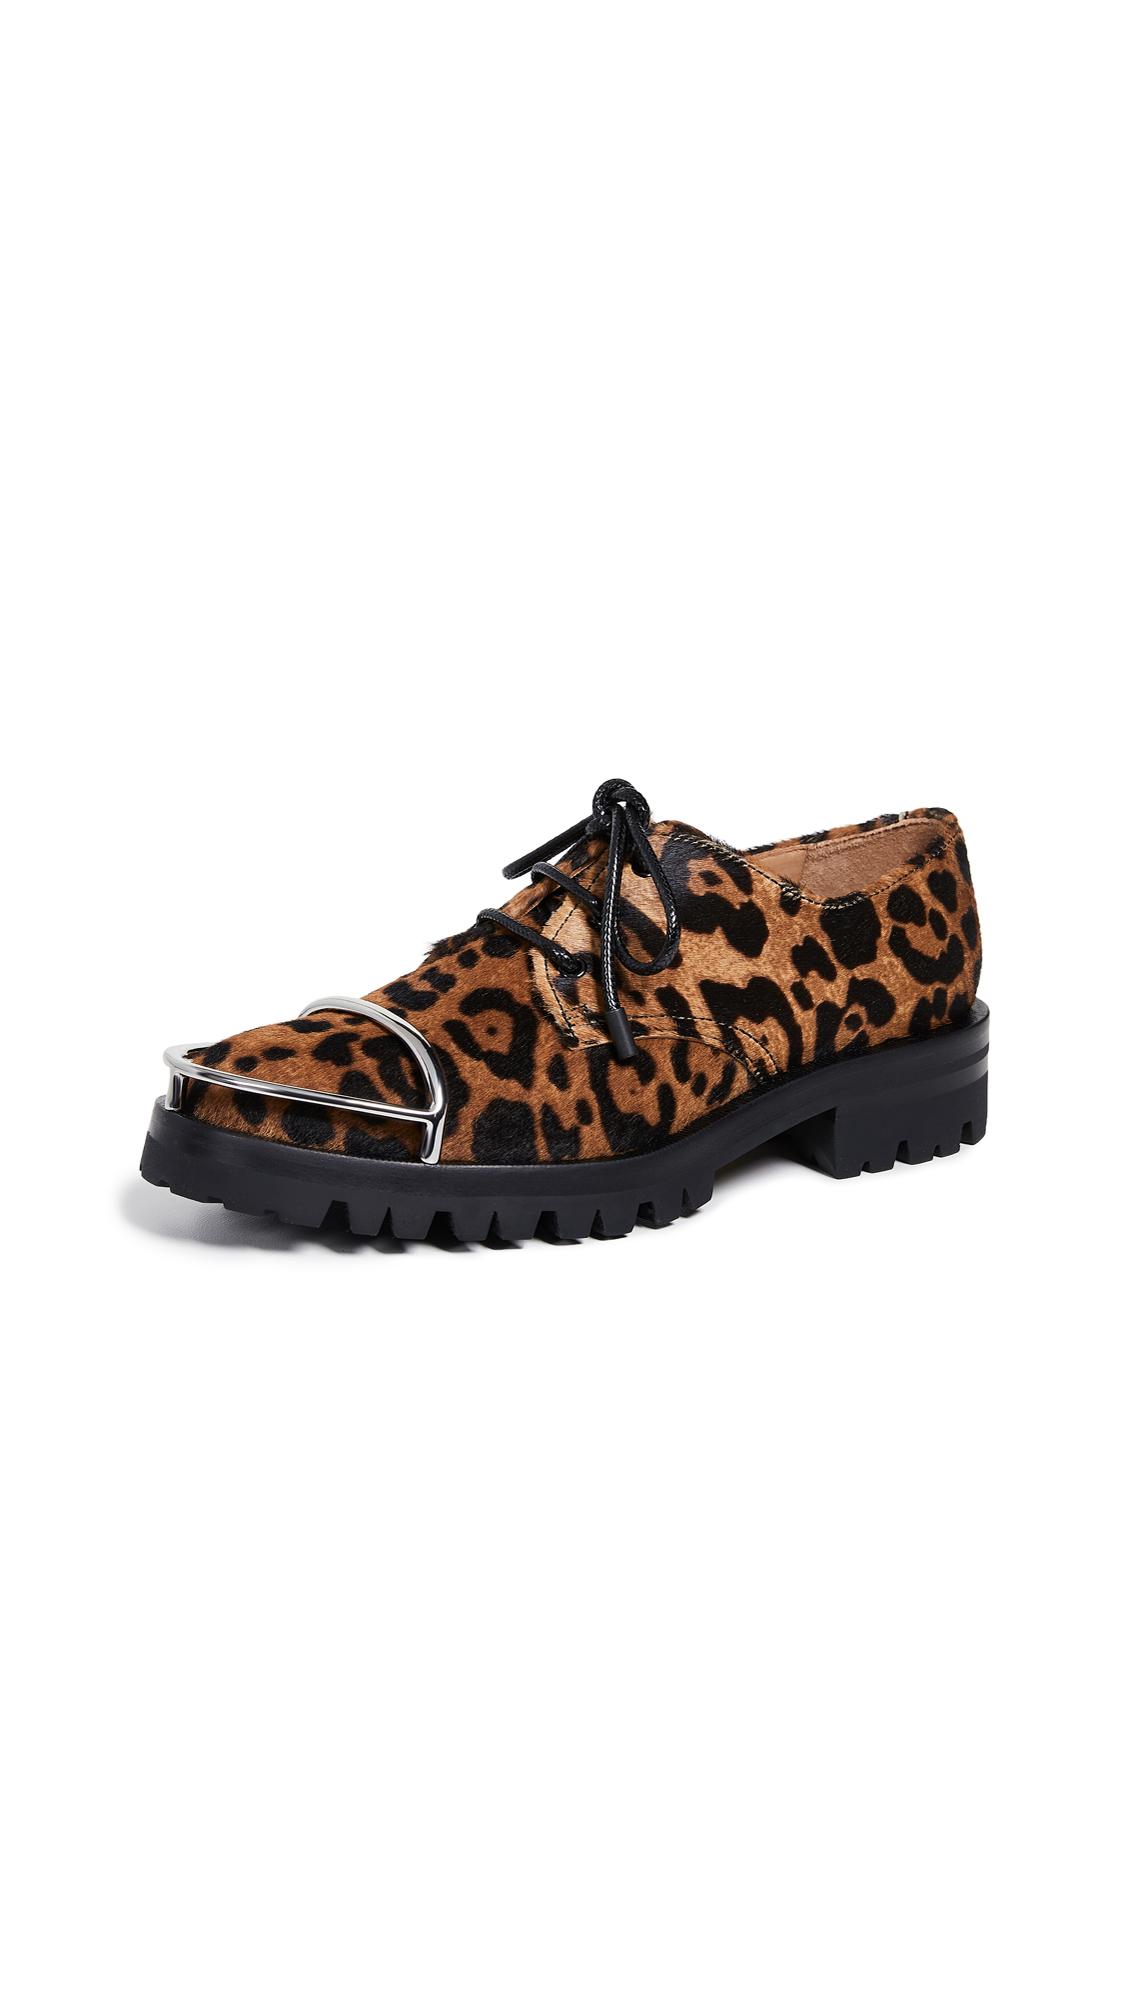 Alexander Wang Lyndon Oxfords - Leopard